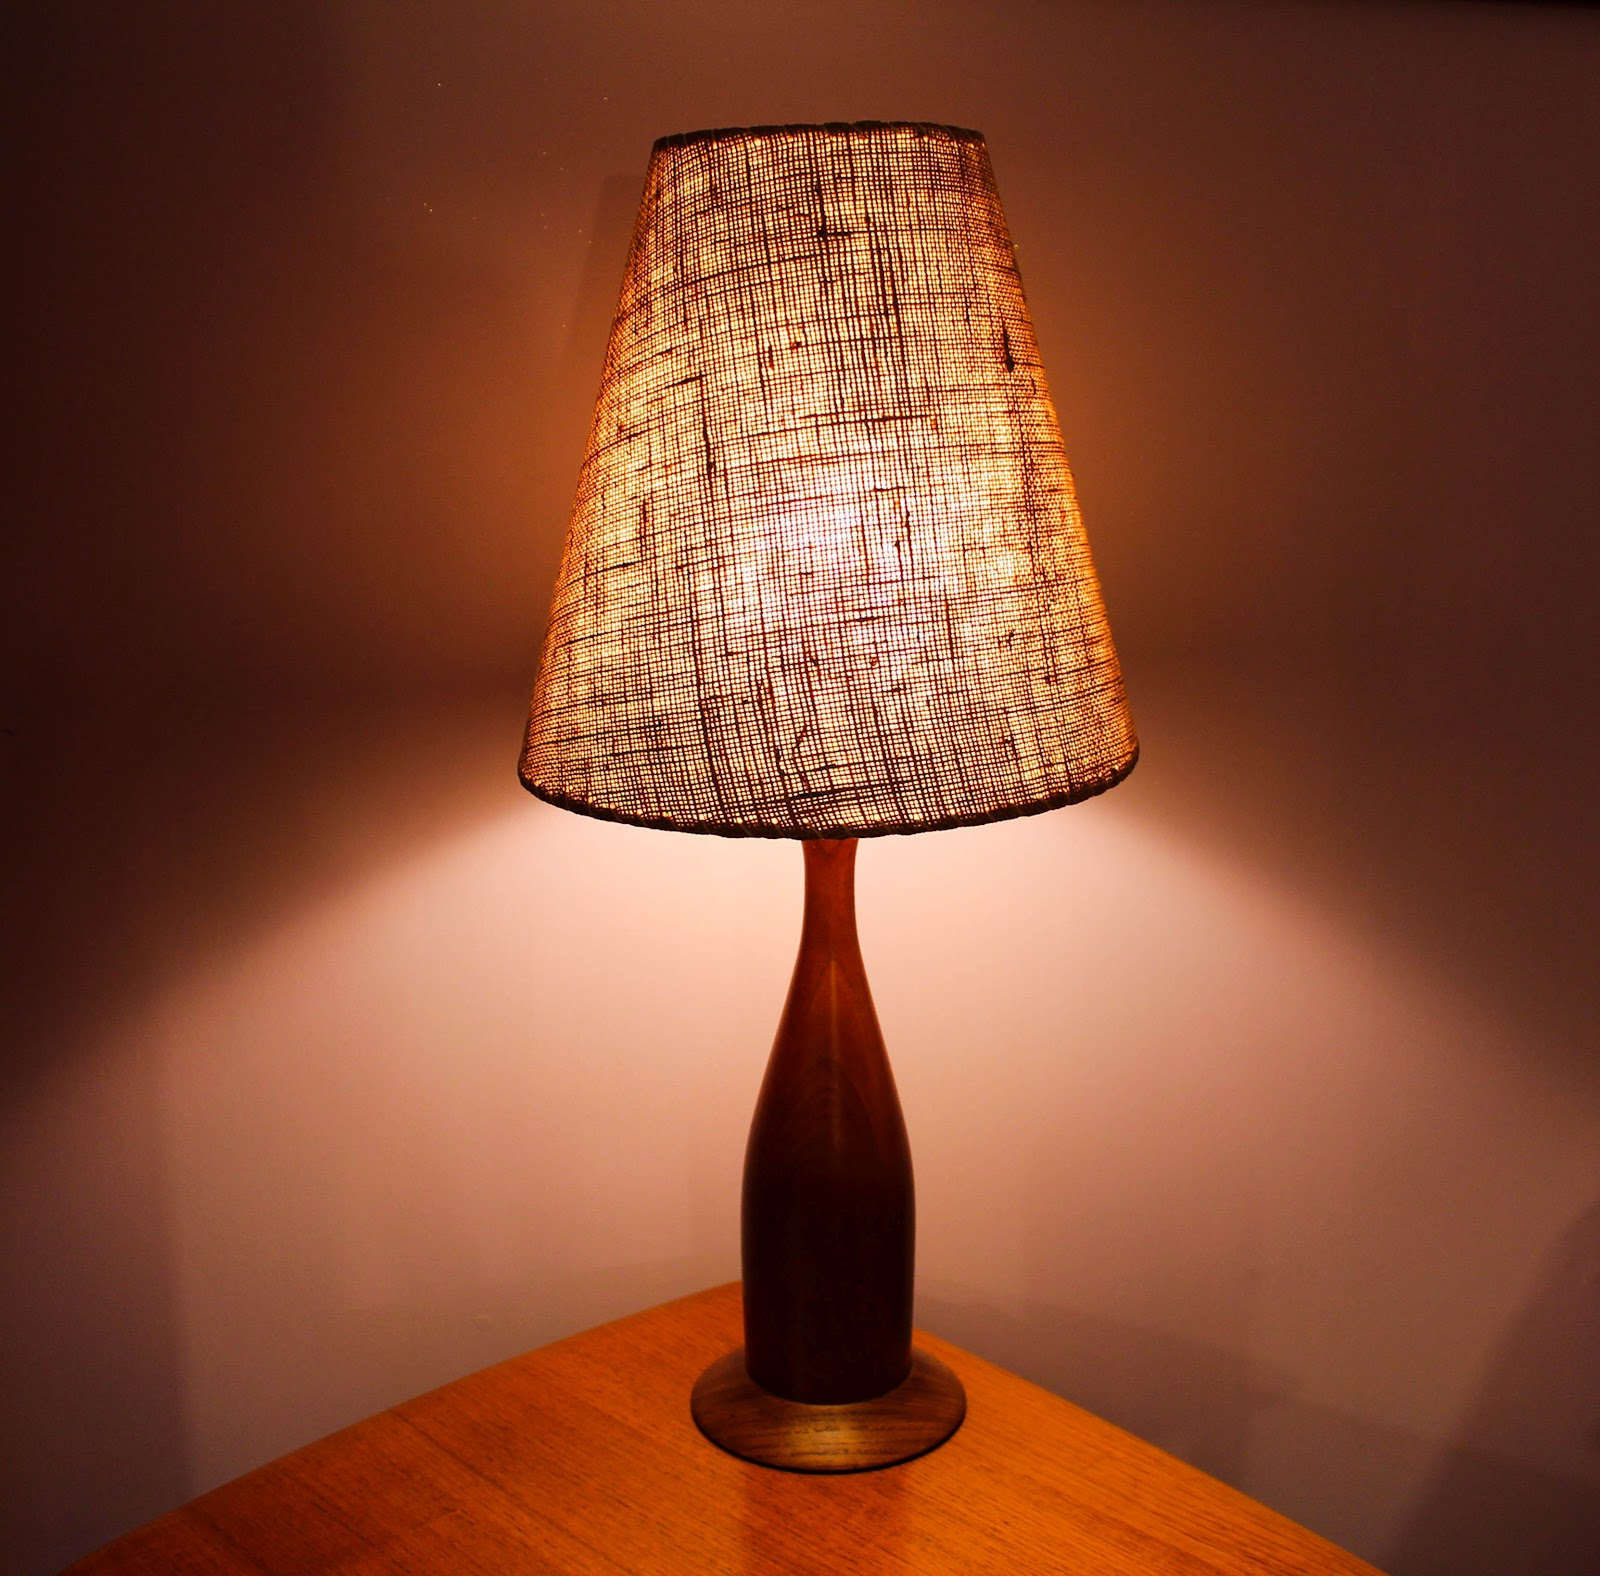 Mansion Decor Danish Mid Century Teak Table Lamp